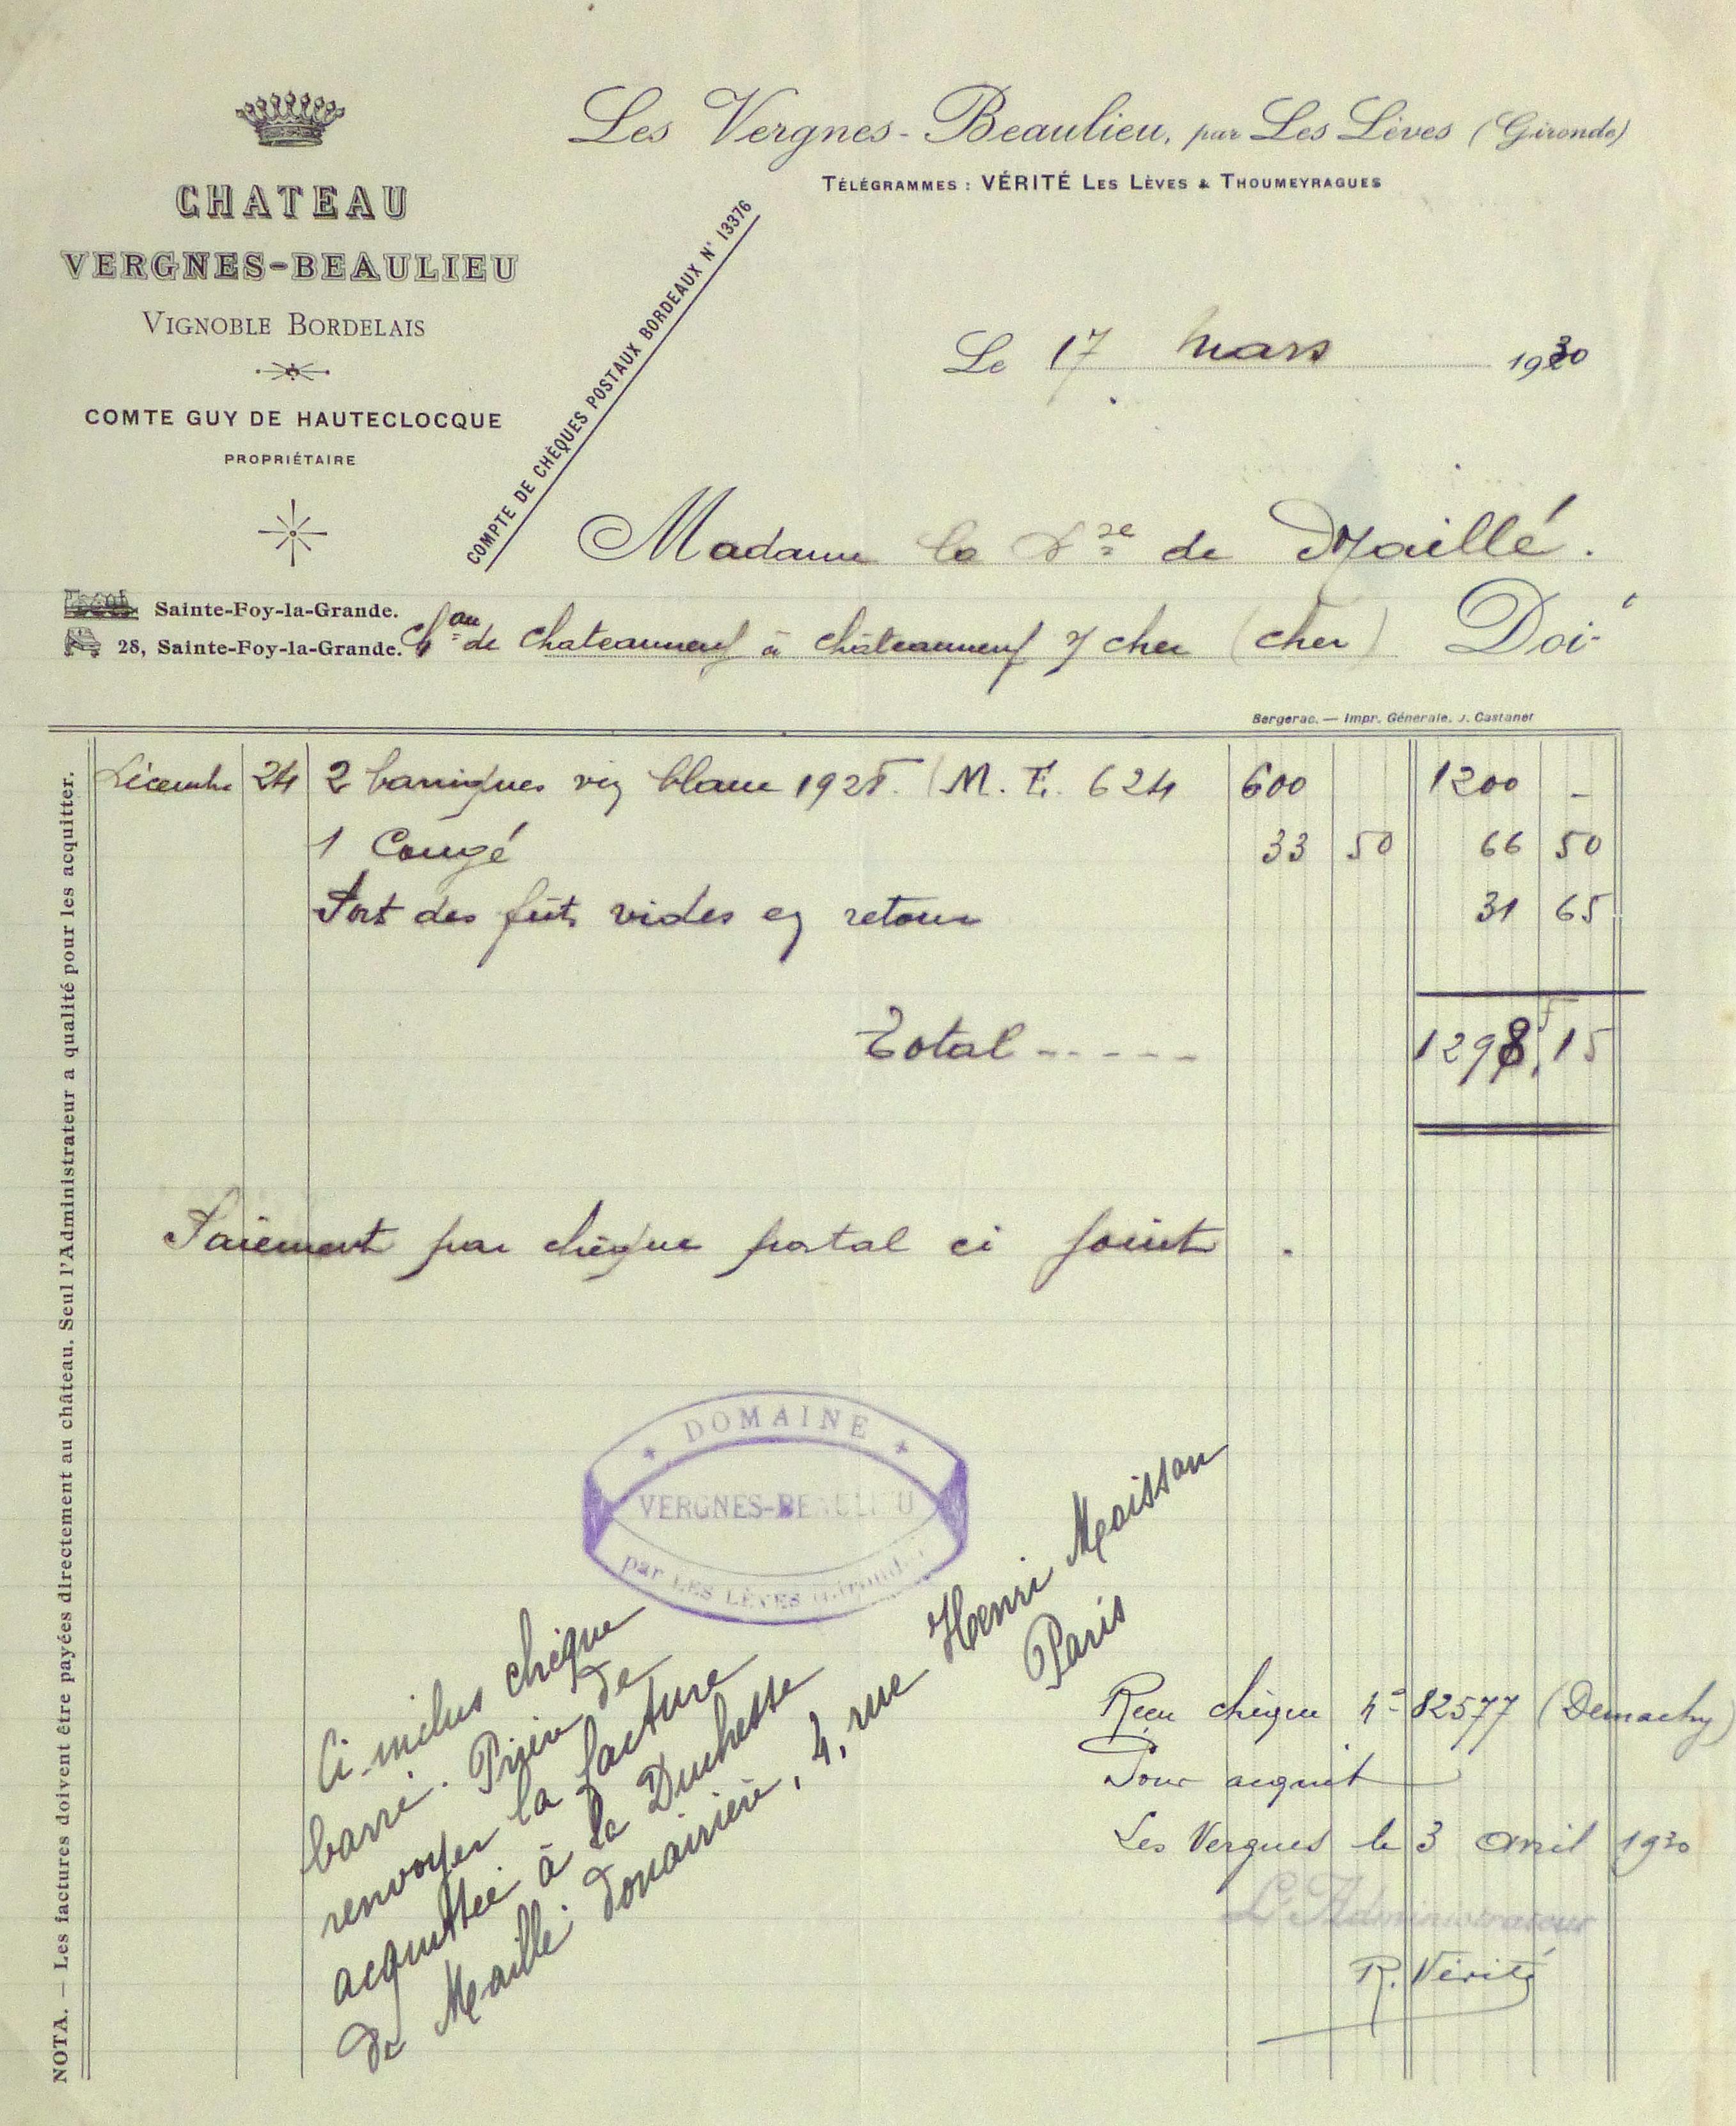 Duchess of Maillé Wine Receipt, 1930-main-10560M